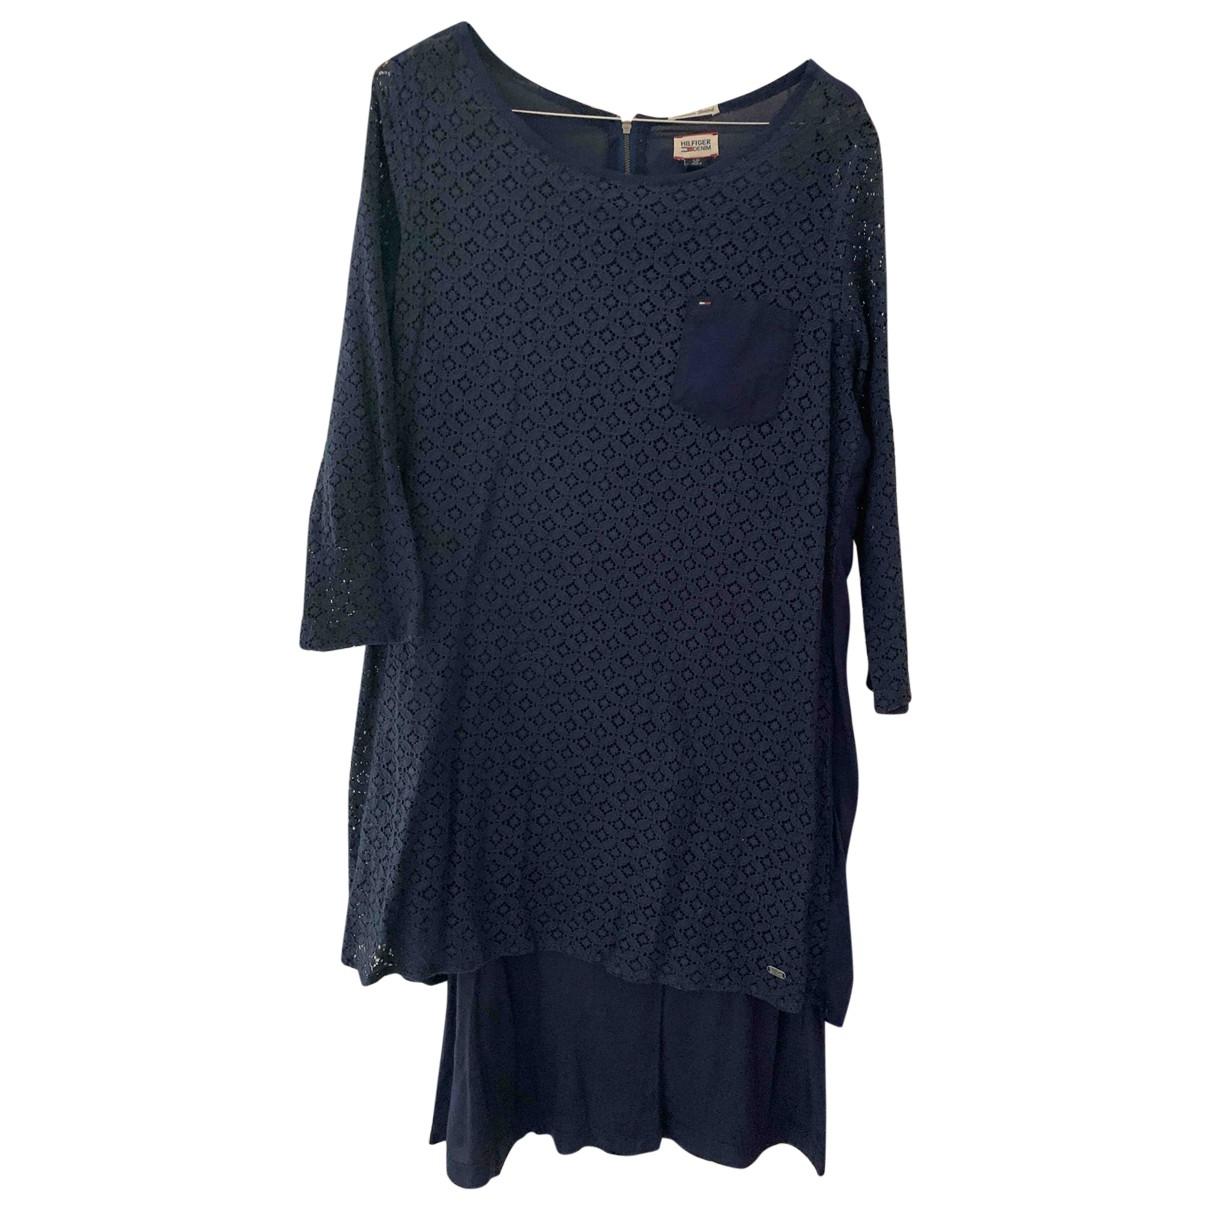 Hilfiger Collection N Blue Cotton dress for Women S International